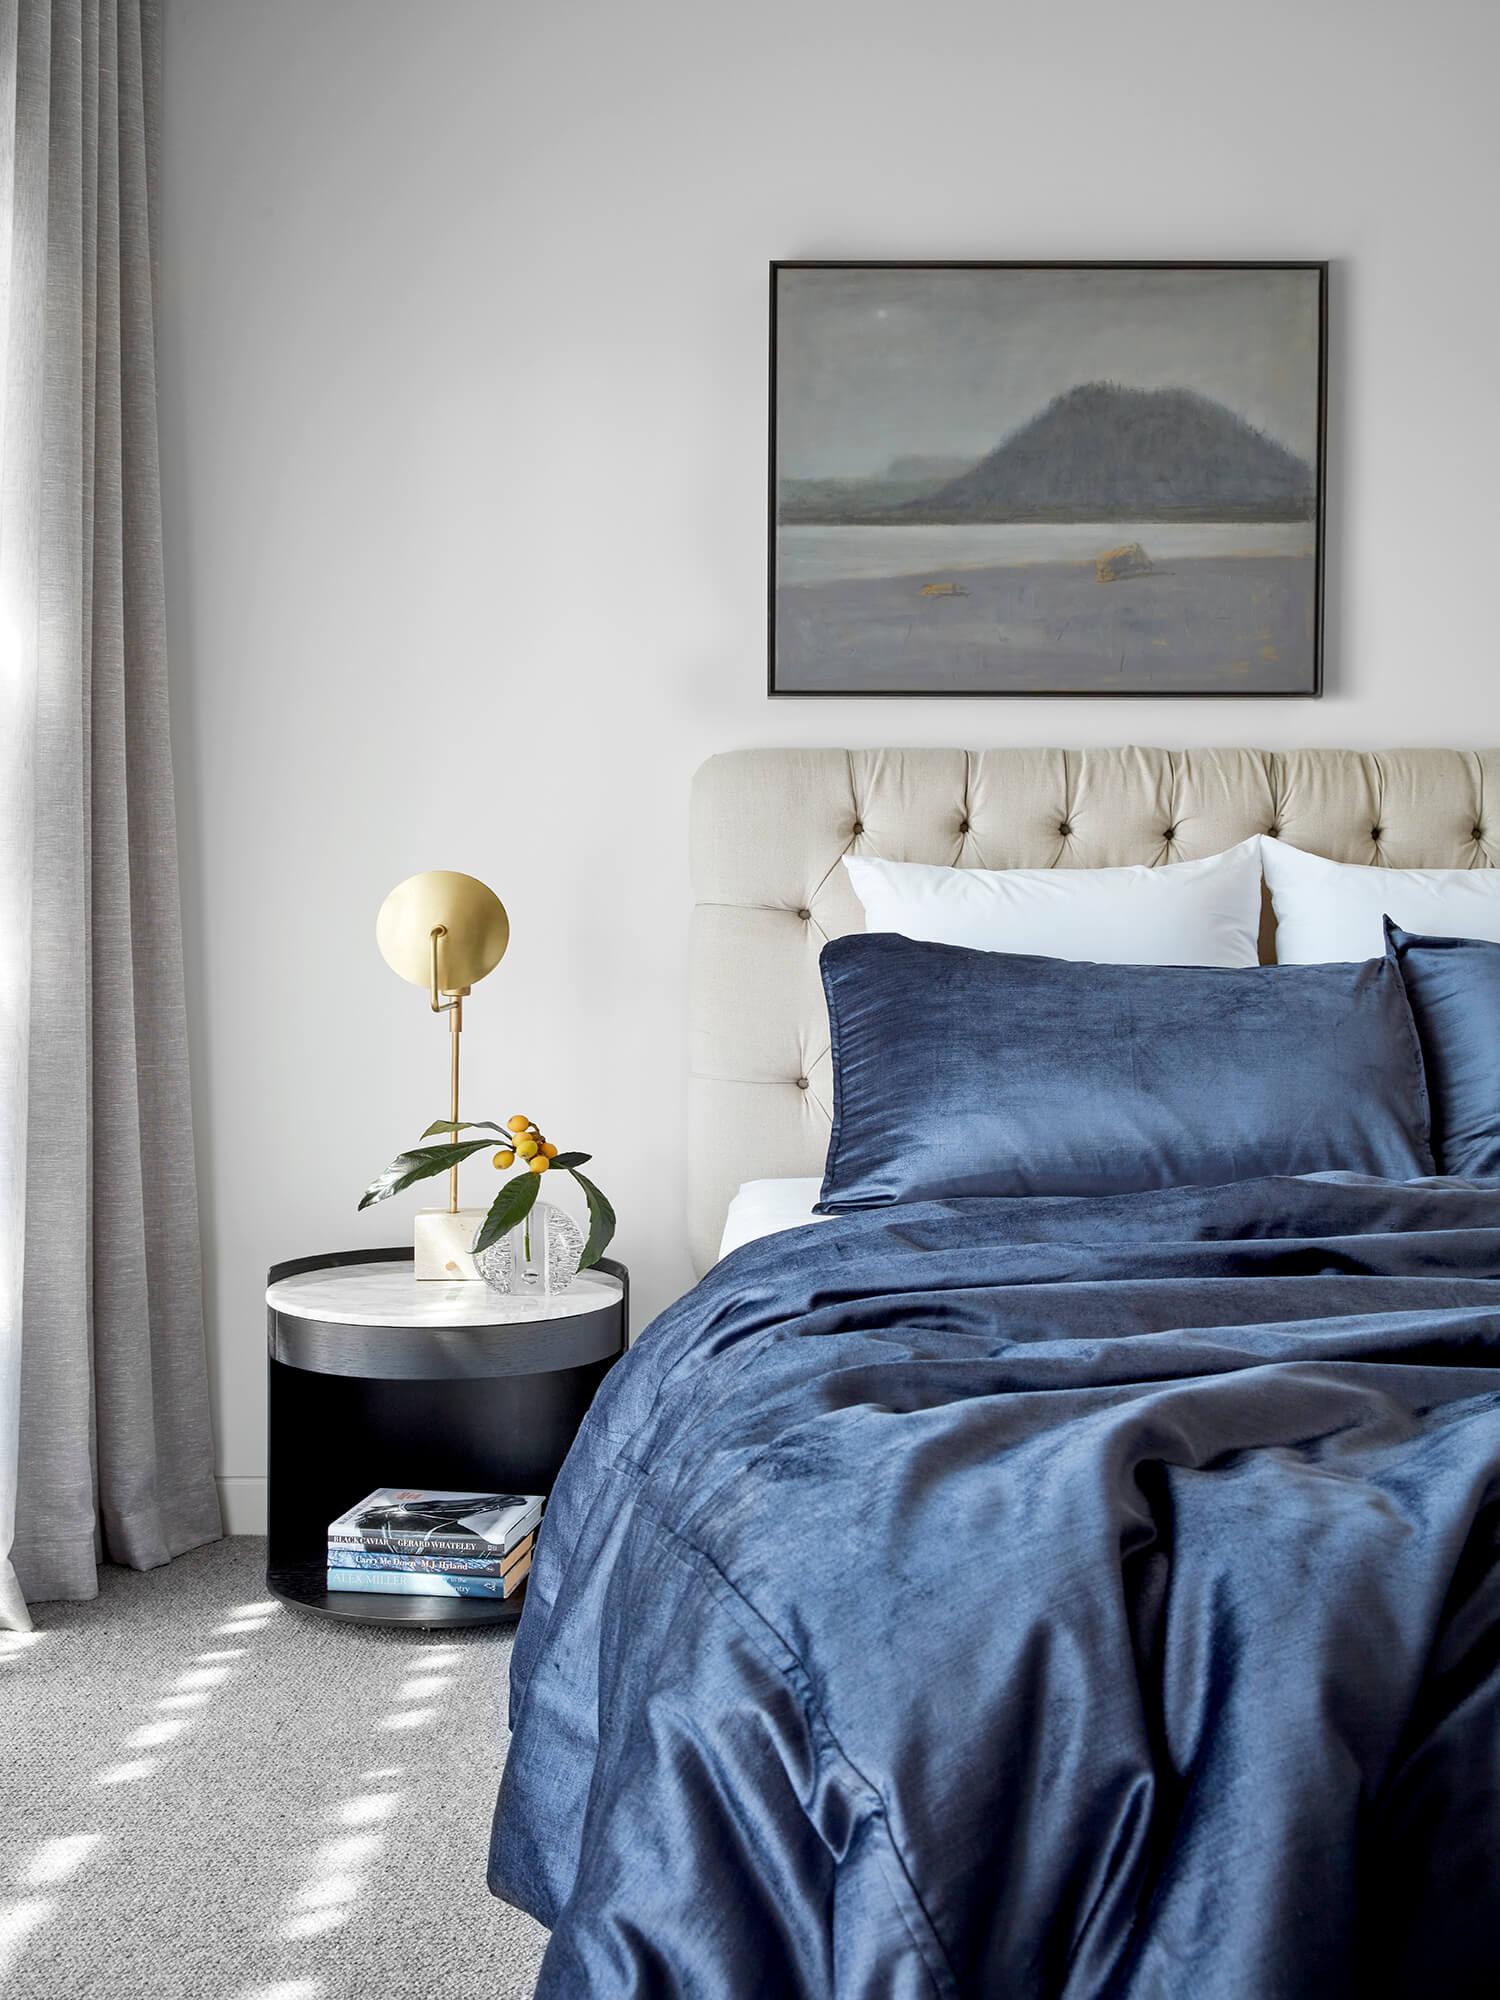 est living interiors Ceres Gable House Tecture 03